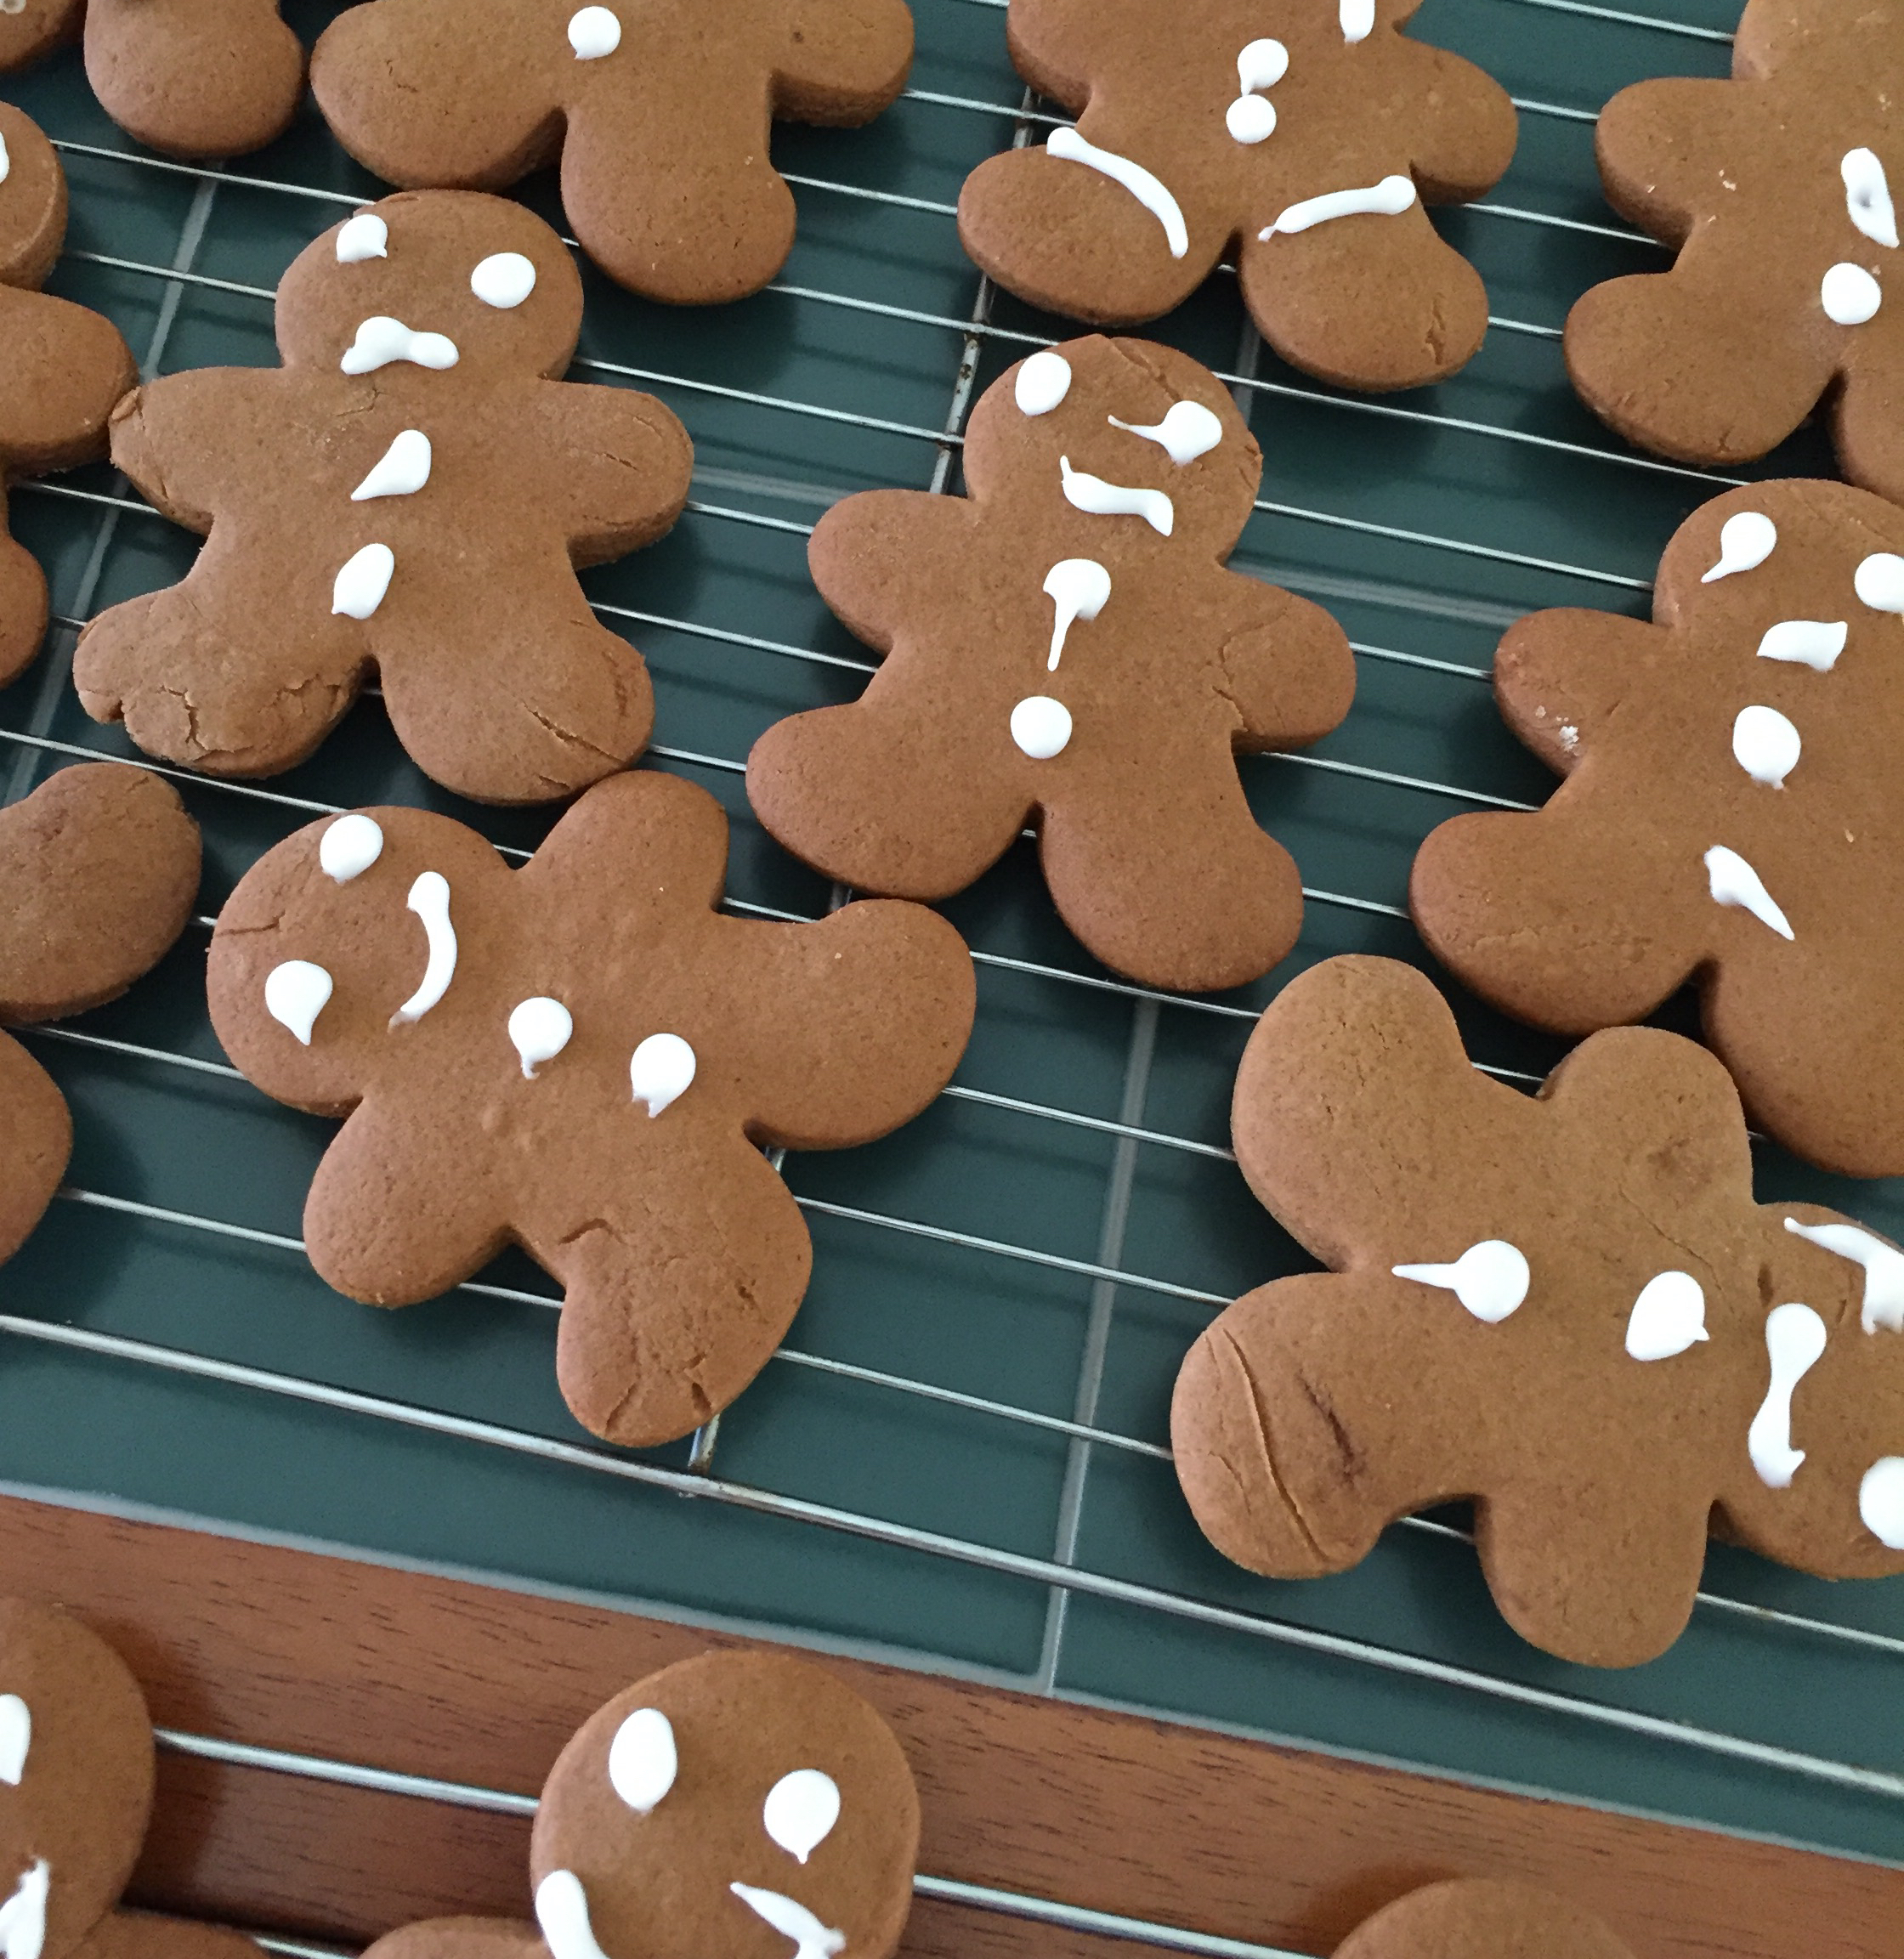 McCormick® Gingerbread Men Cookies diane